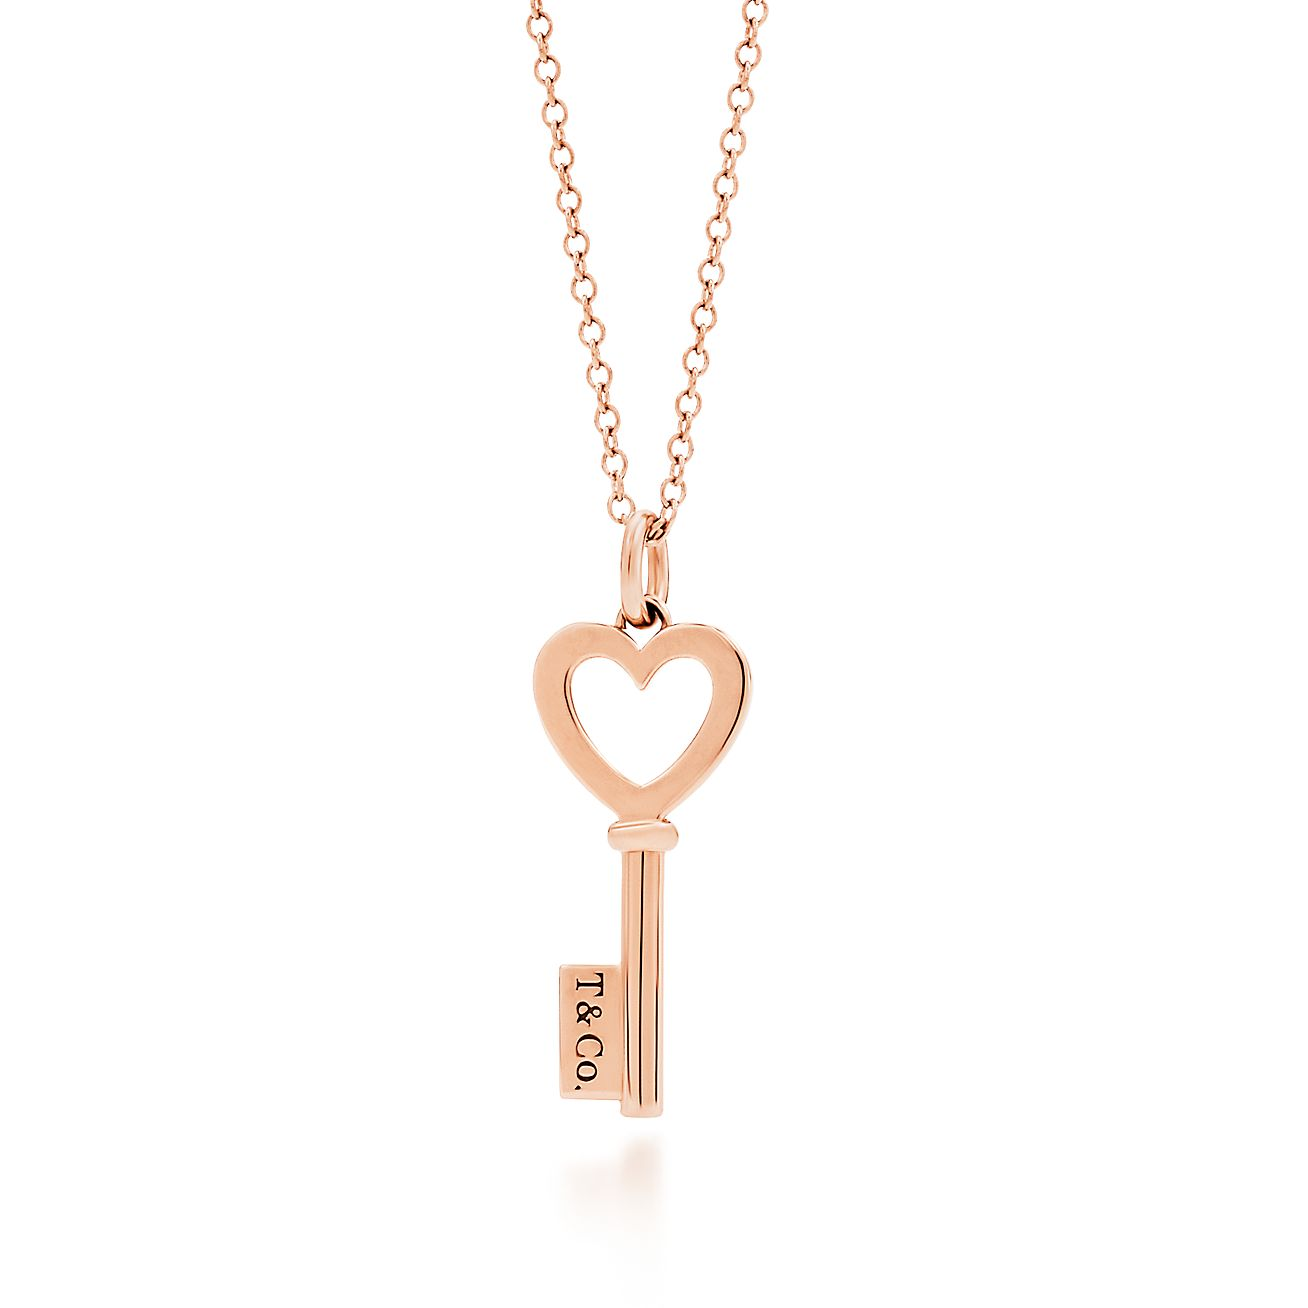 Tiffany Keys Return to Tiffany heart key pendant in 18k rose gold Tiffany & Co. 7YaIcgJJ